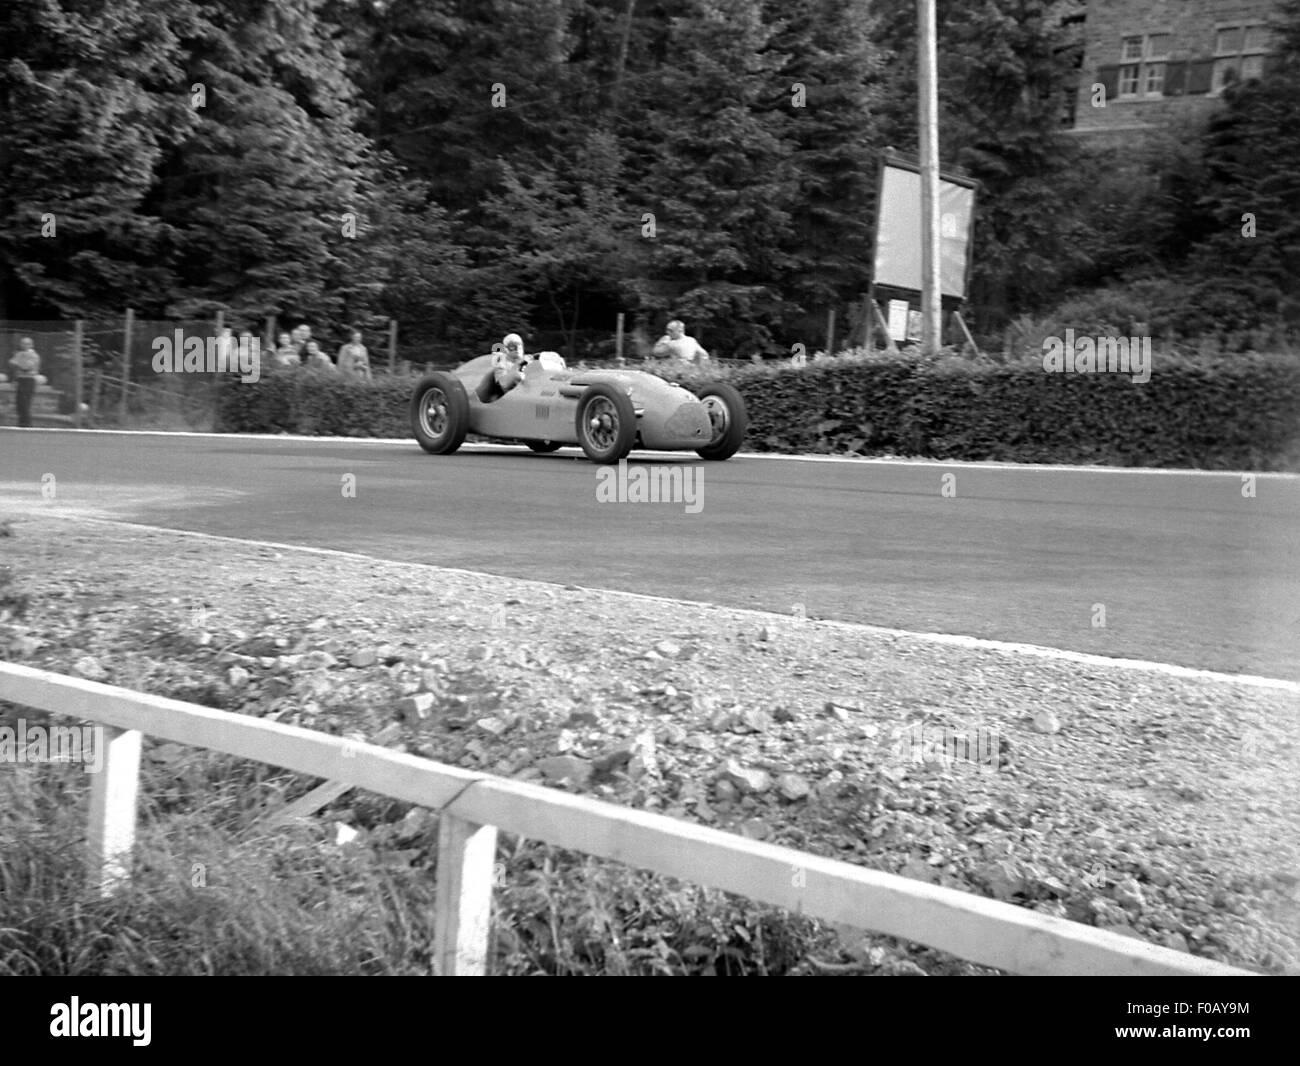 Belgian GP at Spa 1940s - Stock Image